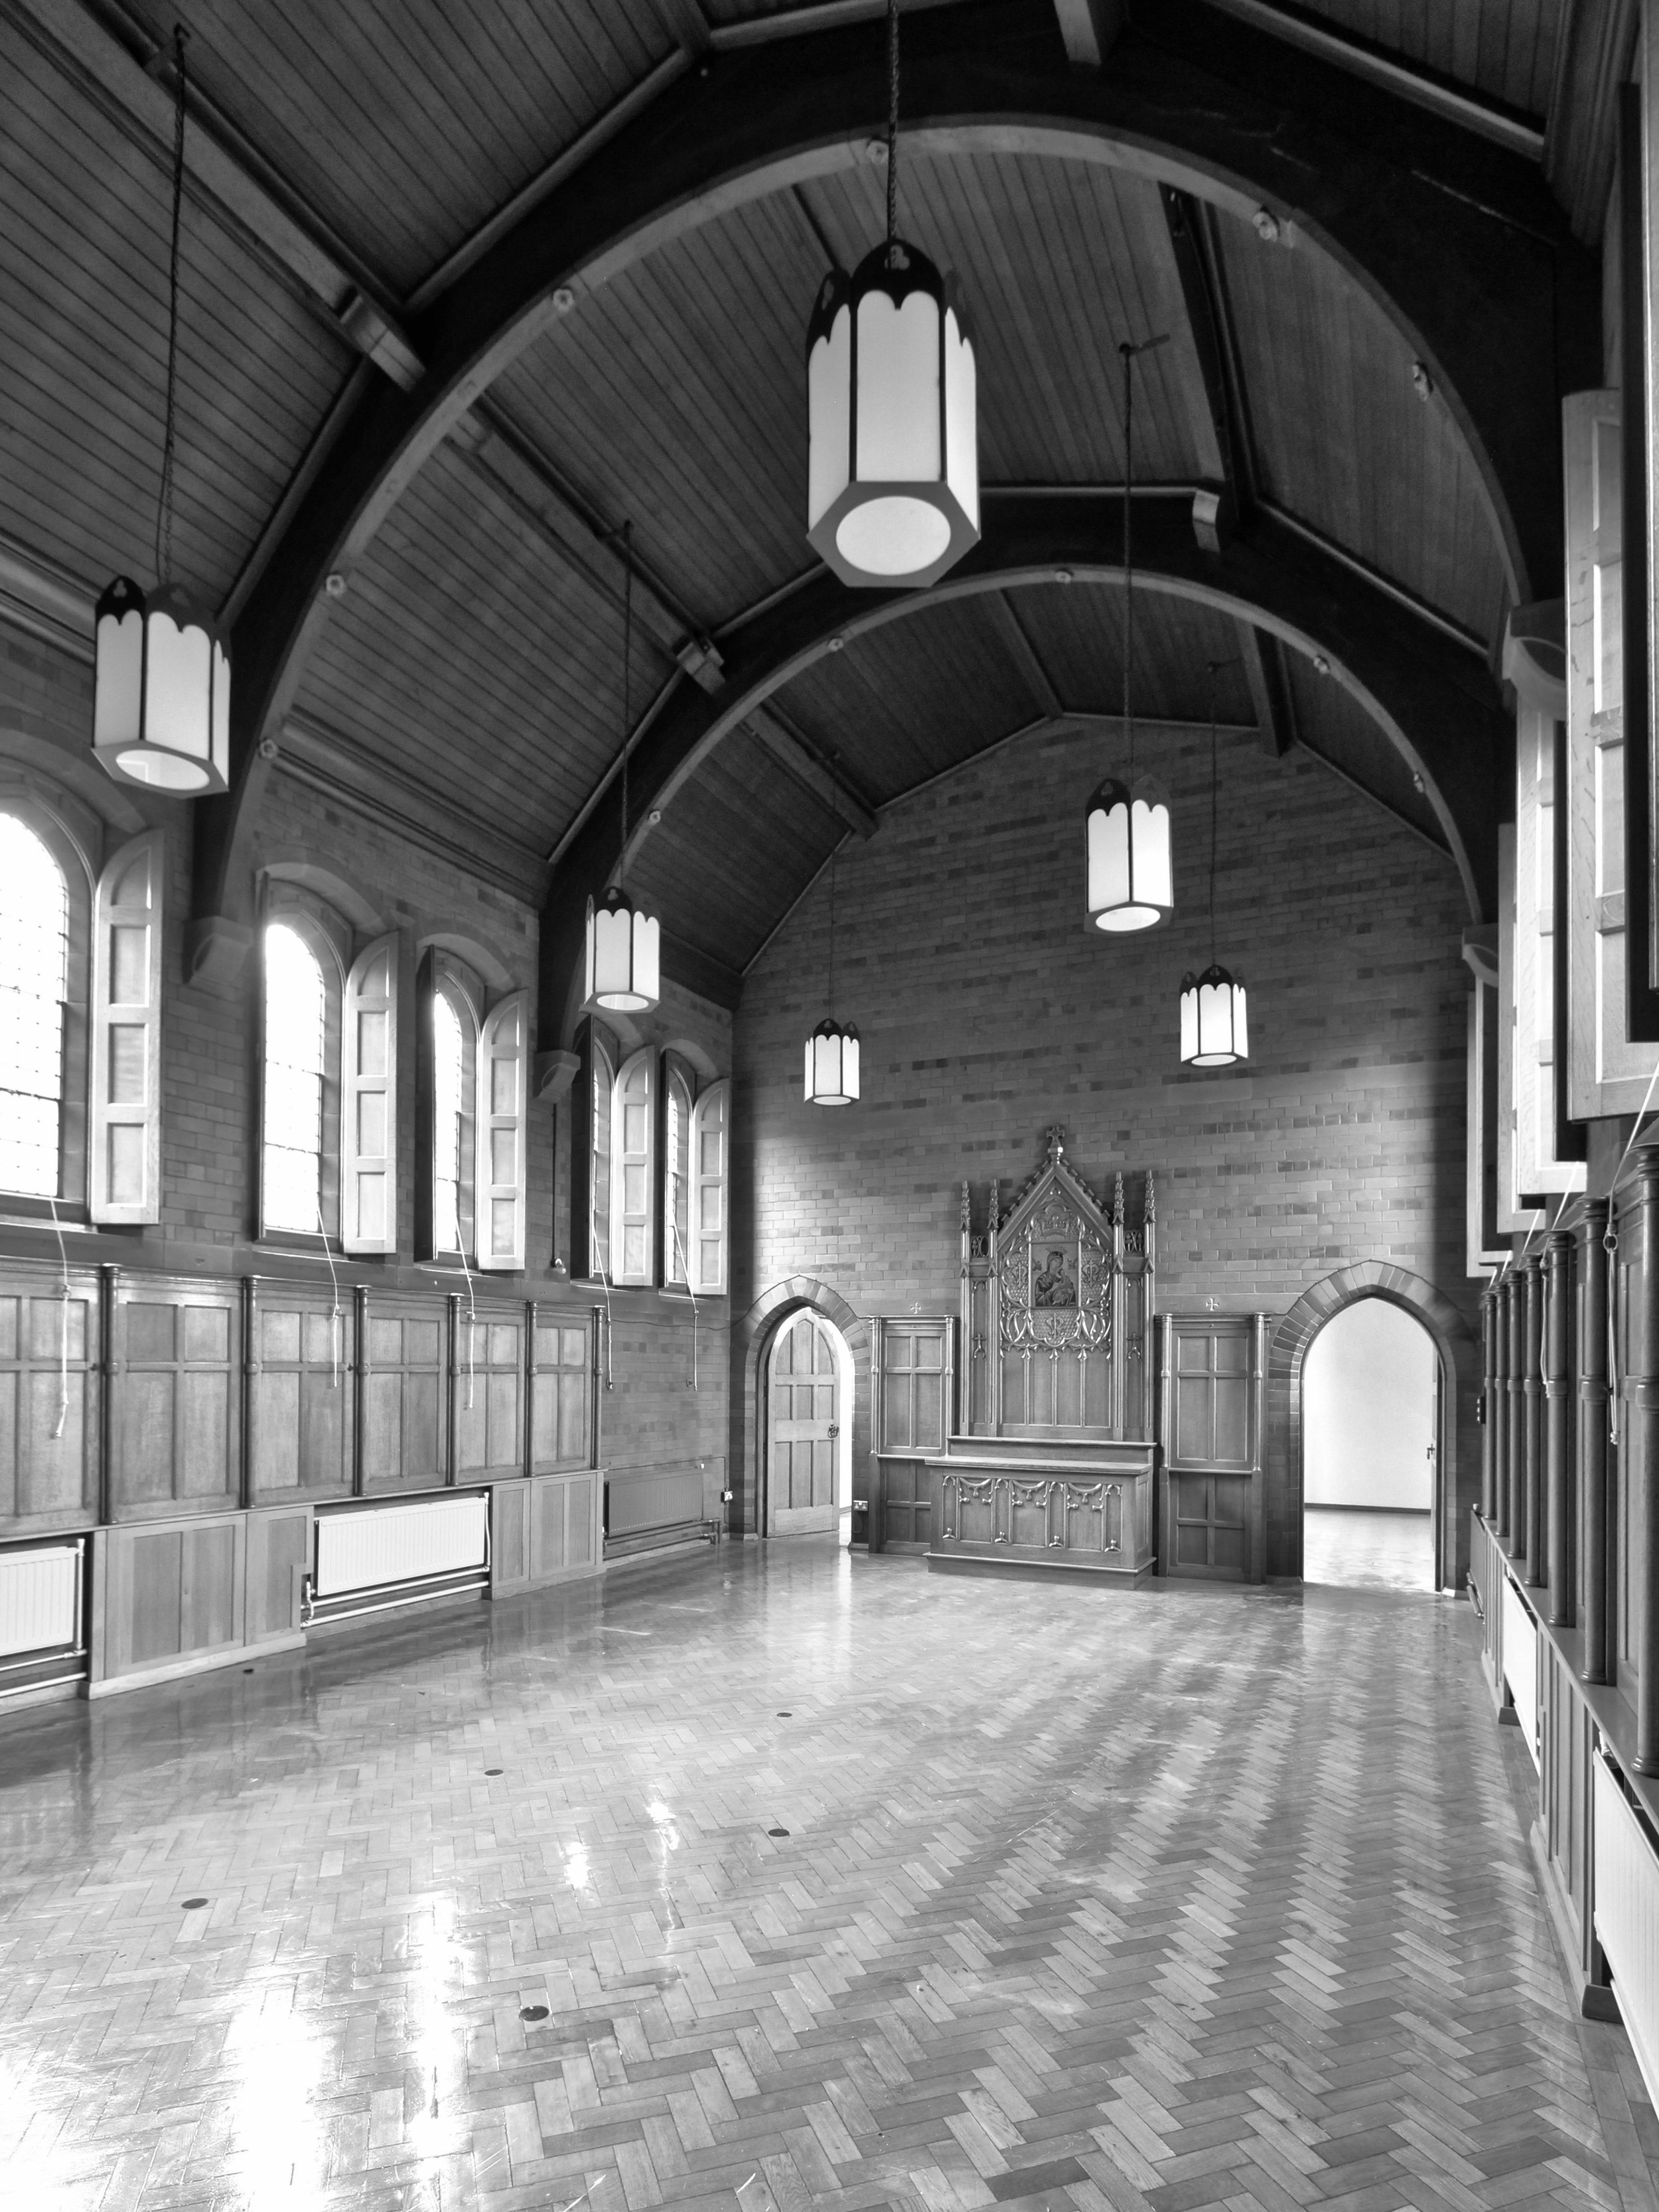 Existing Monastery Interior 2